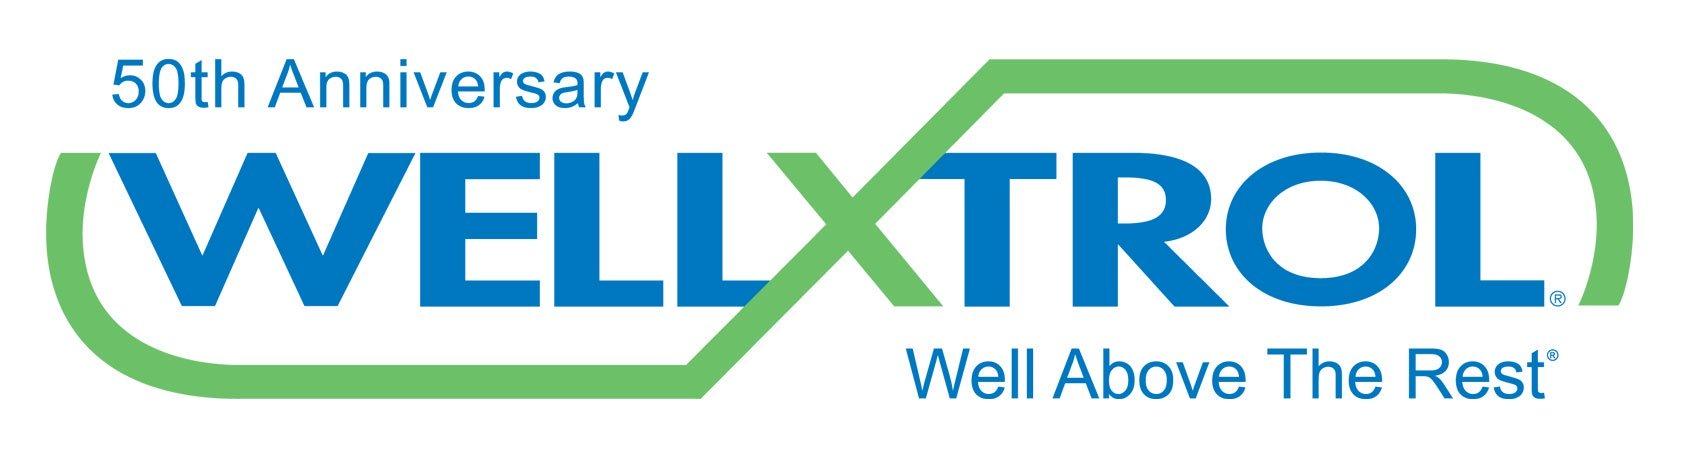 https://0201.nccdn.net/1_2/000/000/19a/1fb/Logo---Amtrol-WX-50th-Anniversary-jpg.jpg